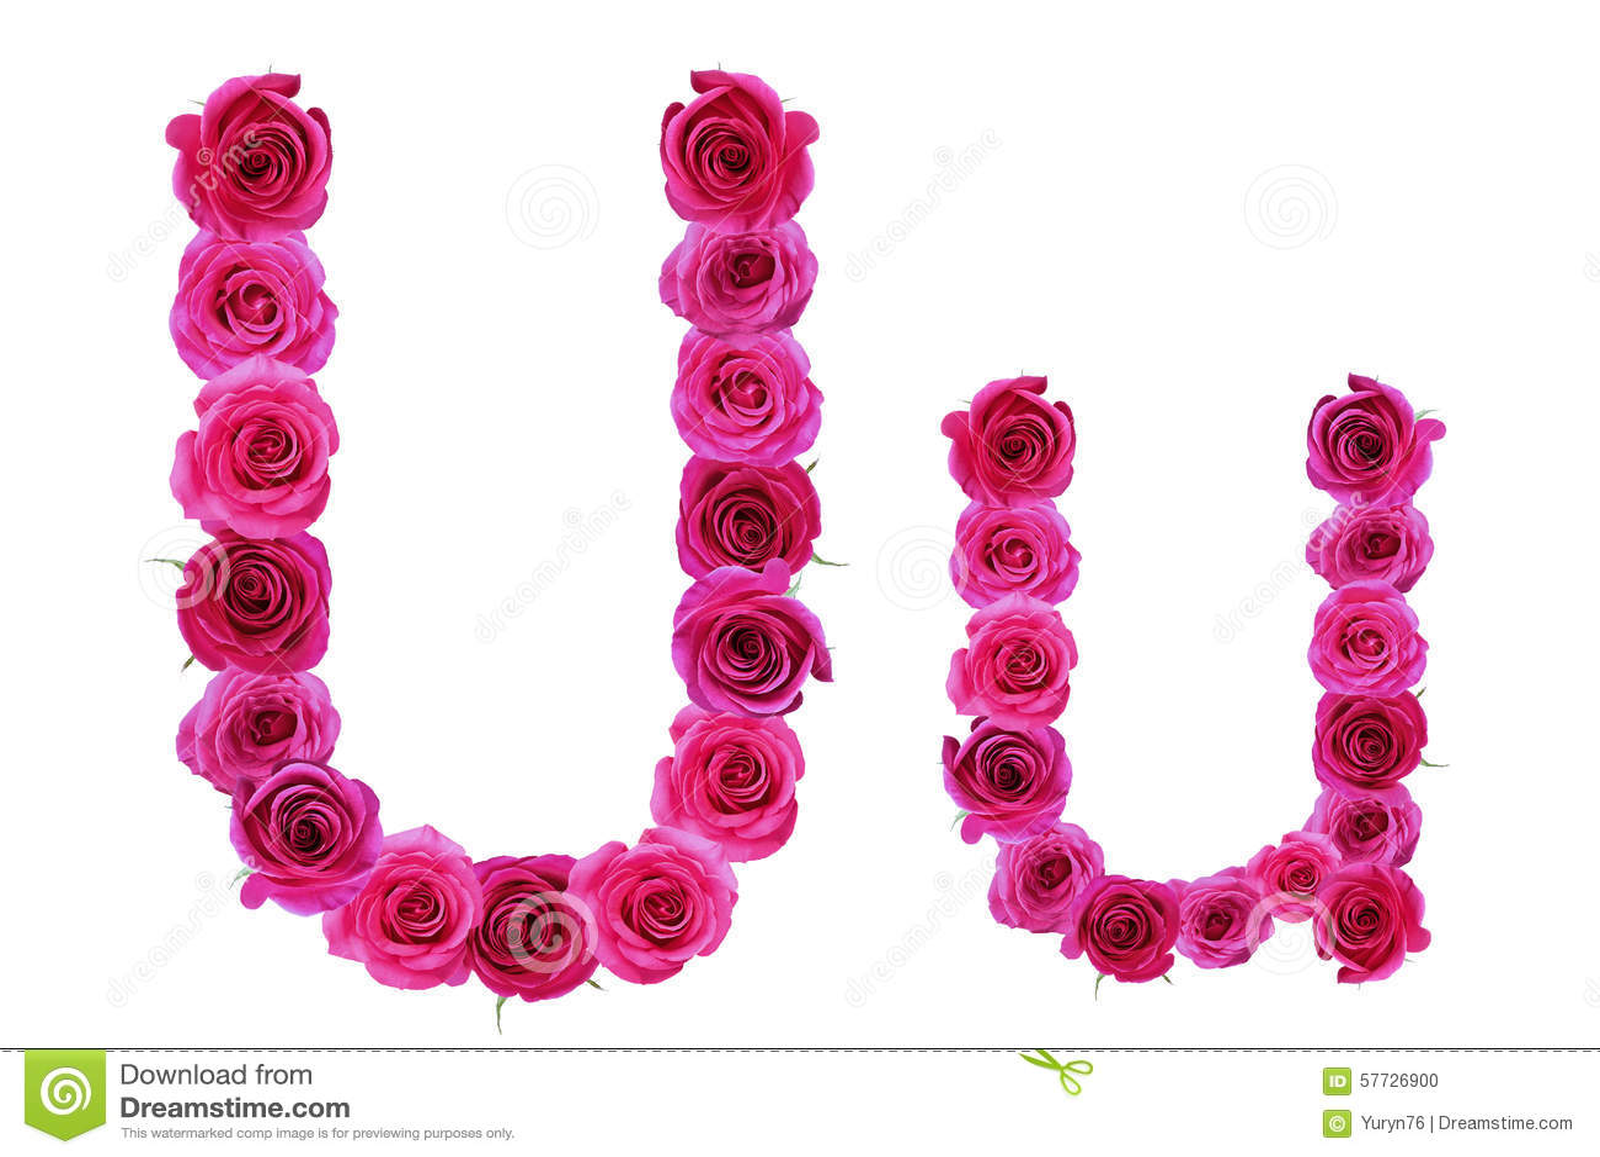 Letter U Of Roses Stock Photo Image Of Rose Flower 57726900